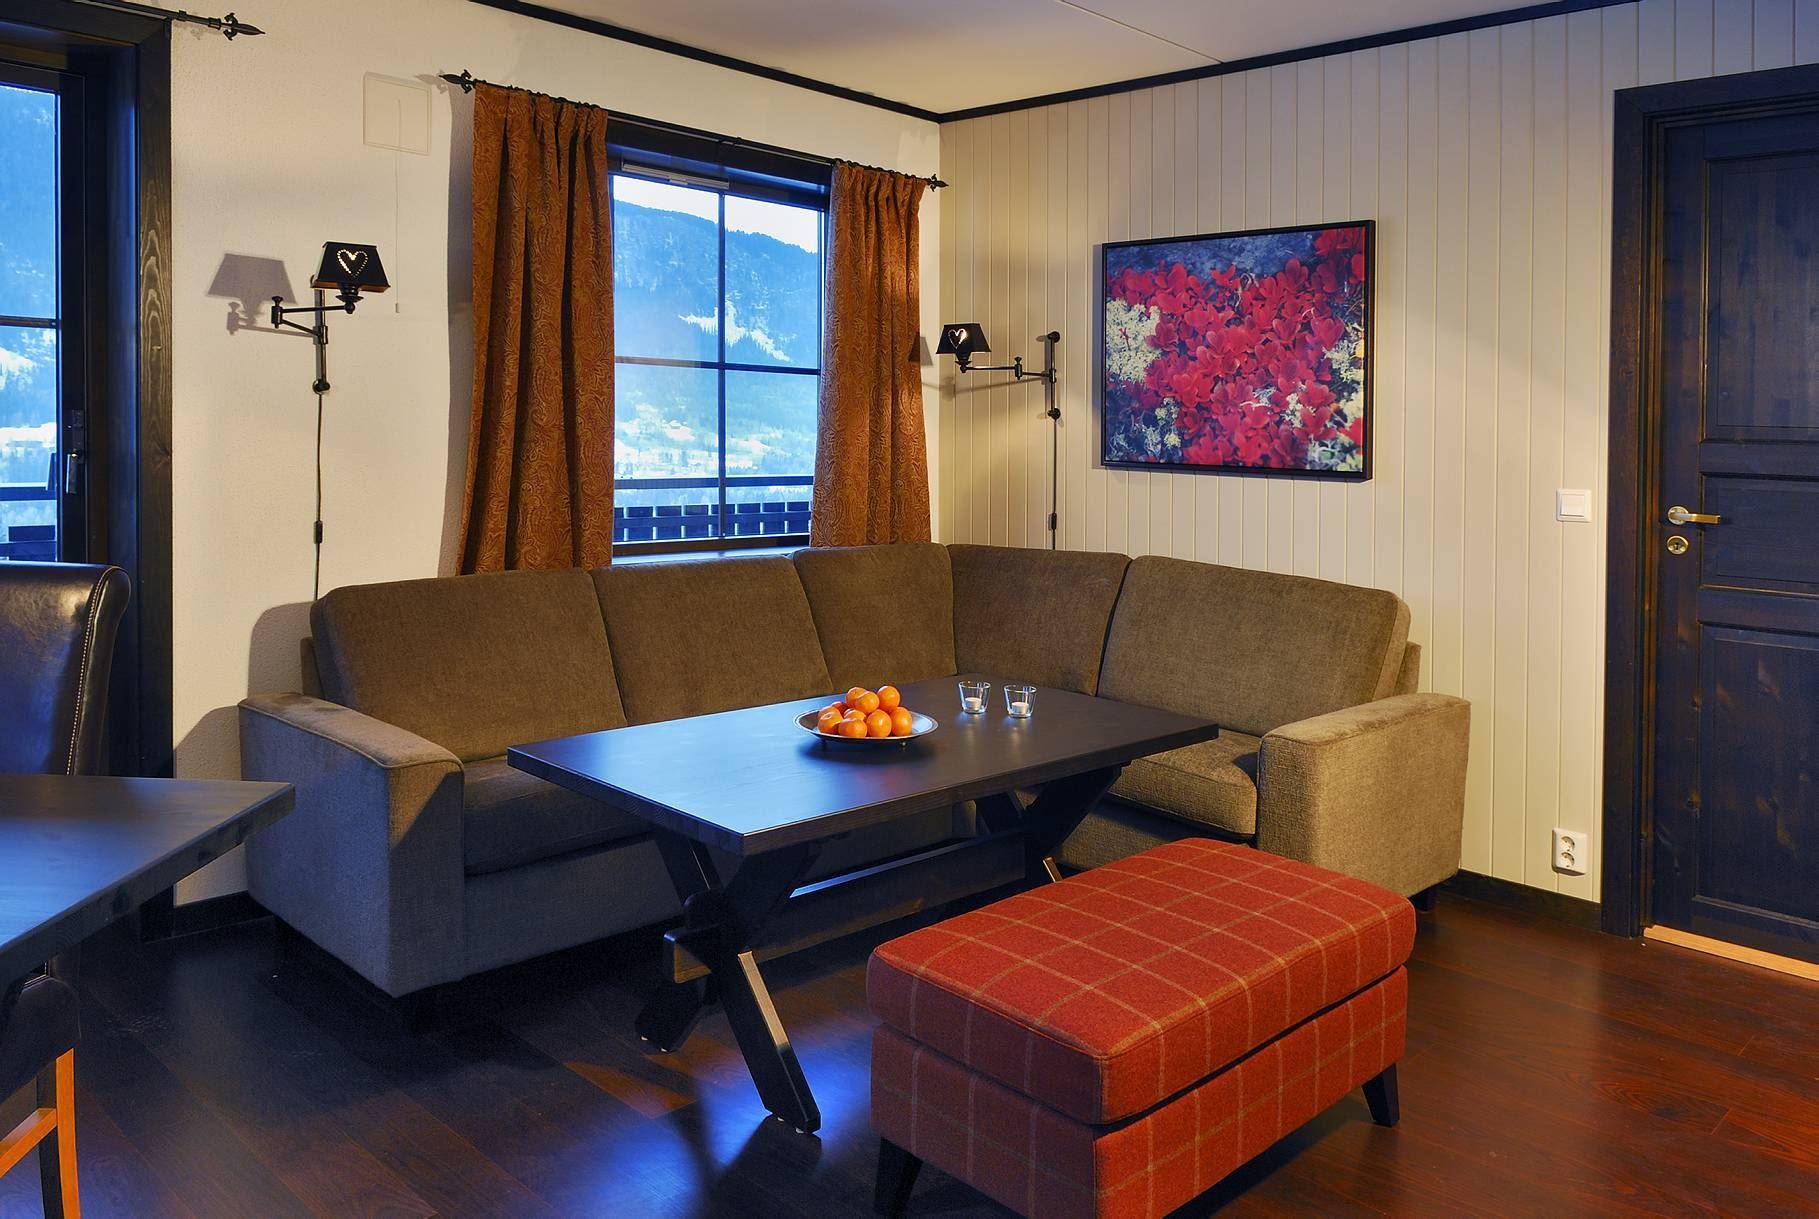 Artfoto,  © Hafjell Resort, Bo godt i leiligheter under Lillehammer cup i fotball